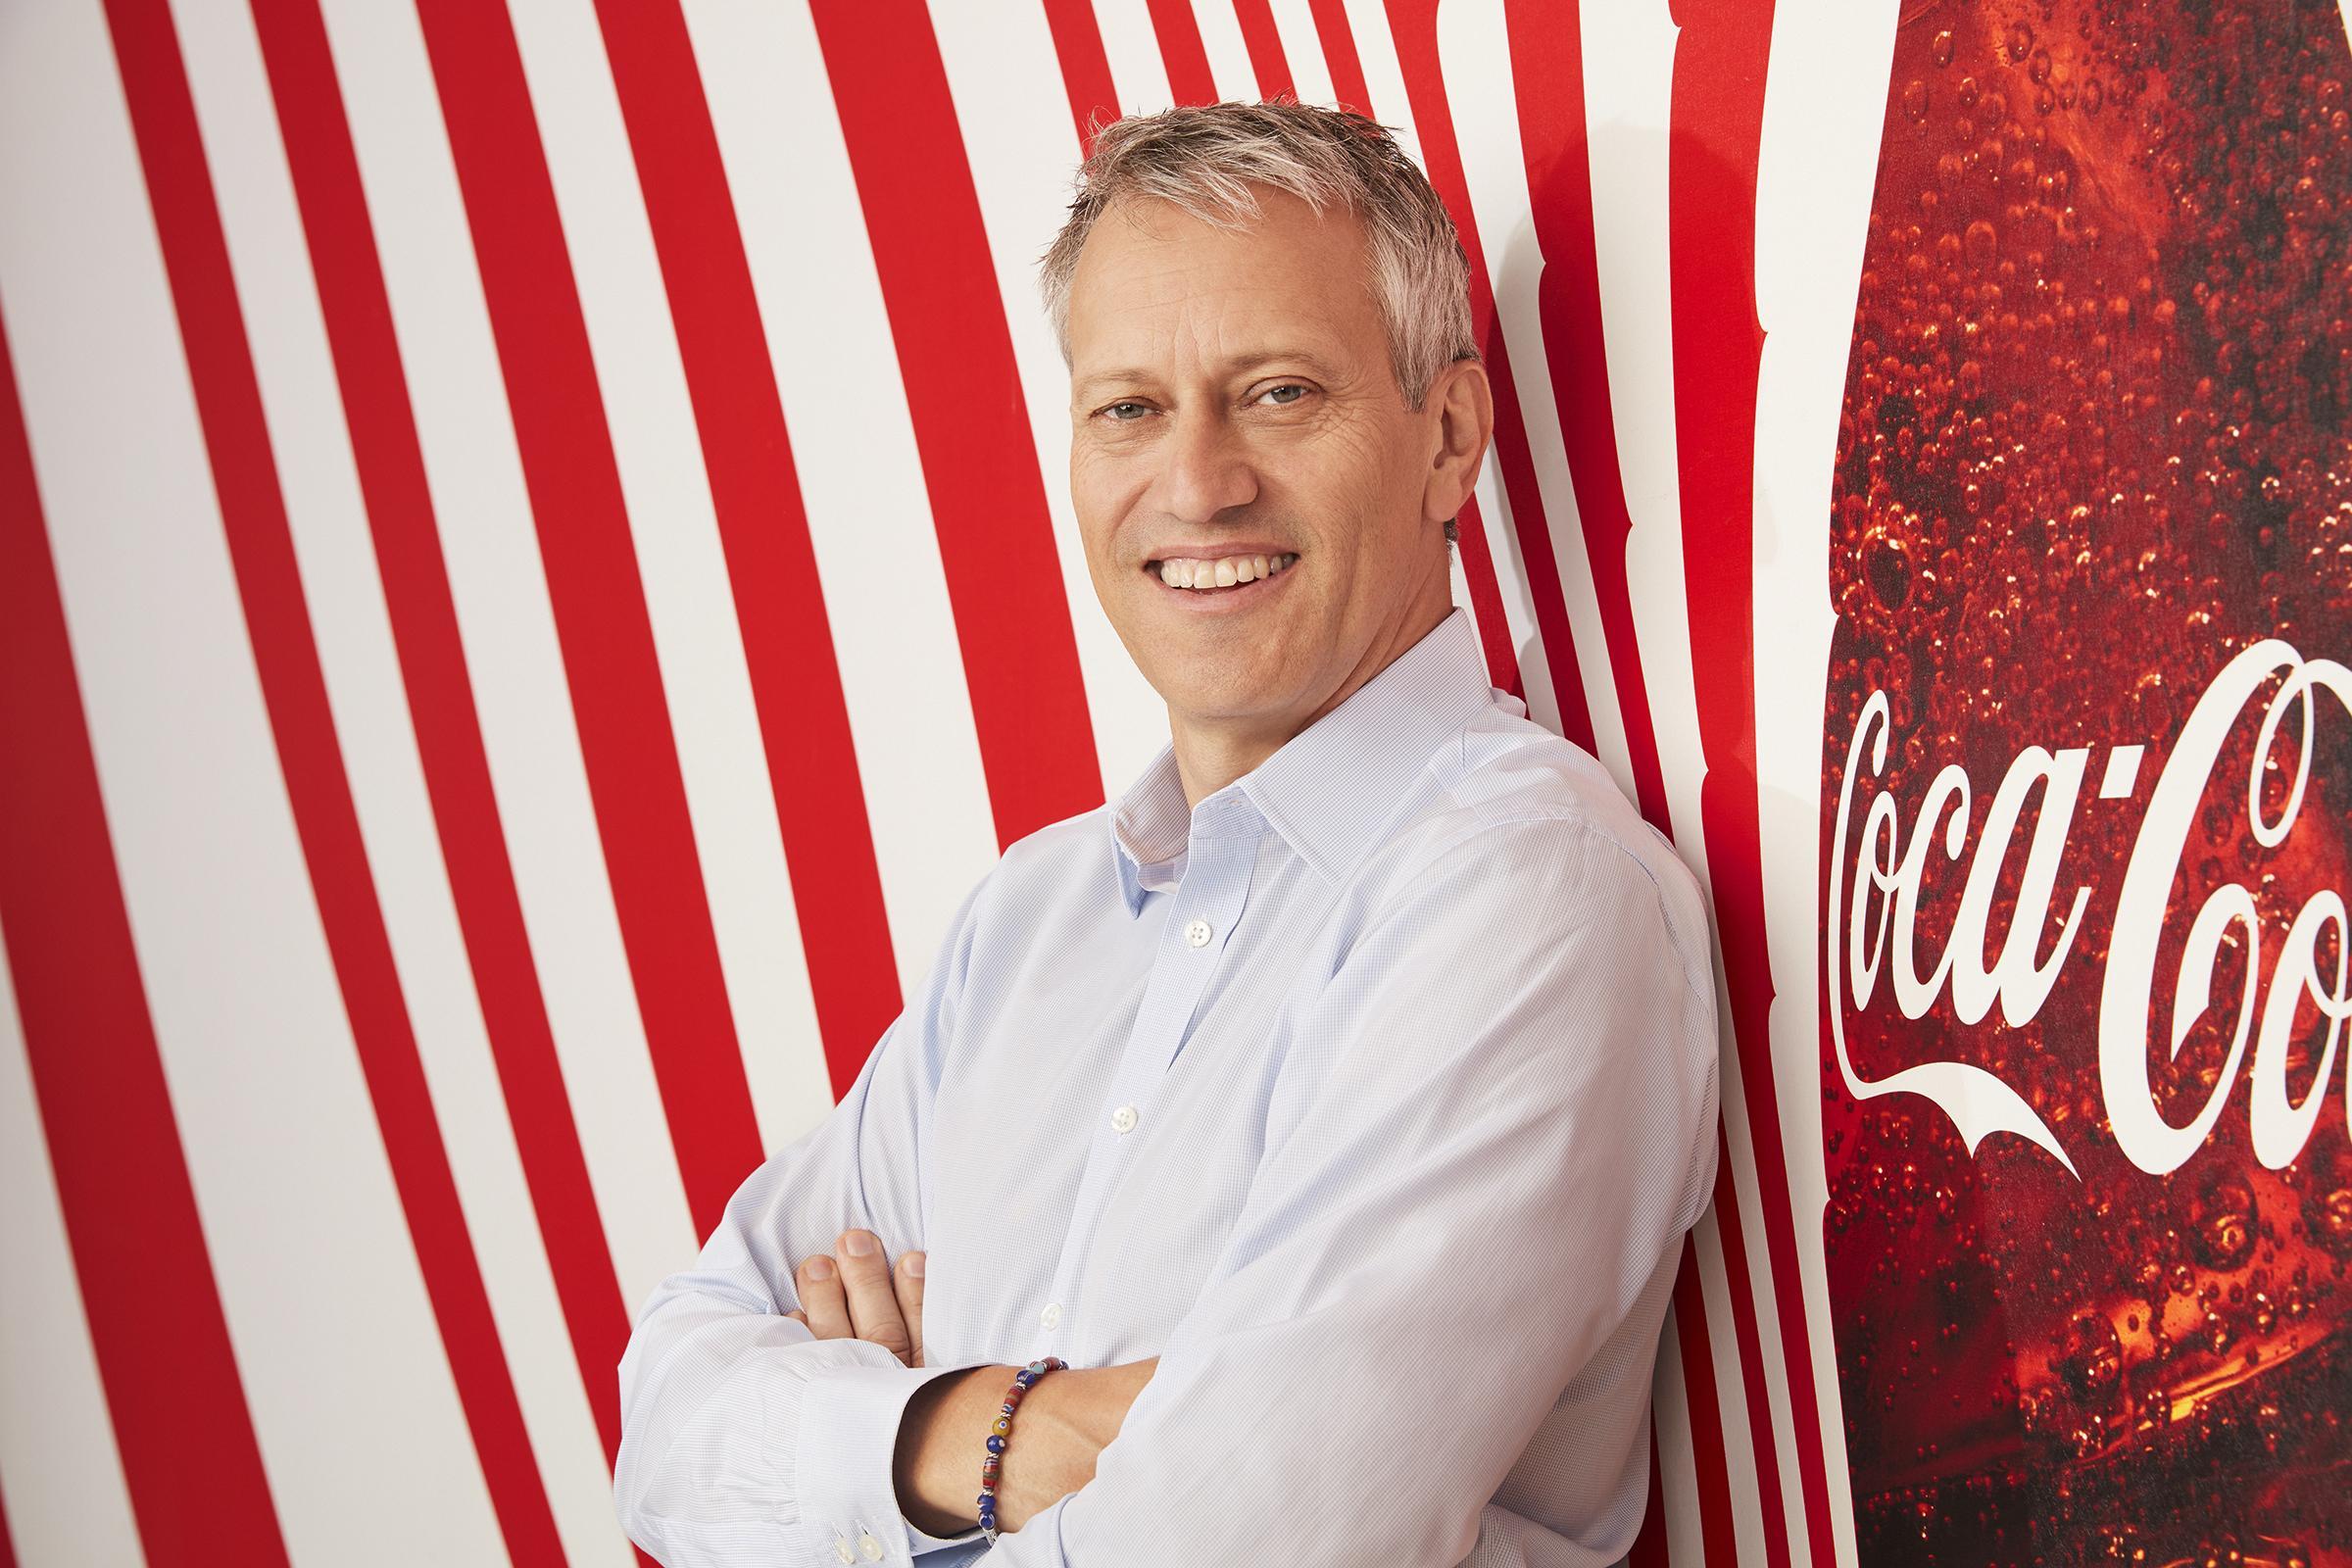 James Quincey, prezident a CEO Coca-Coly